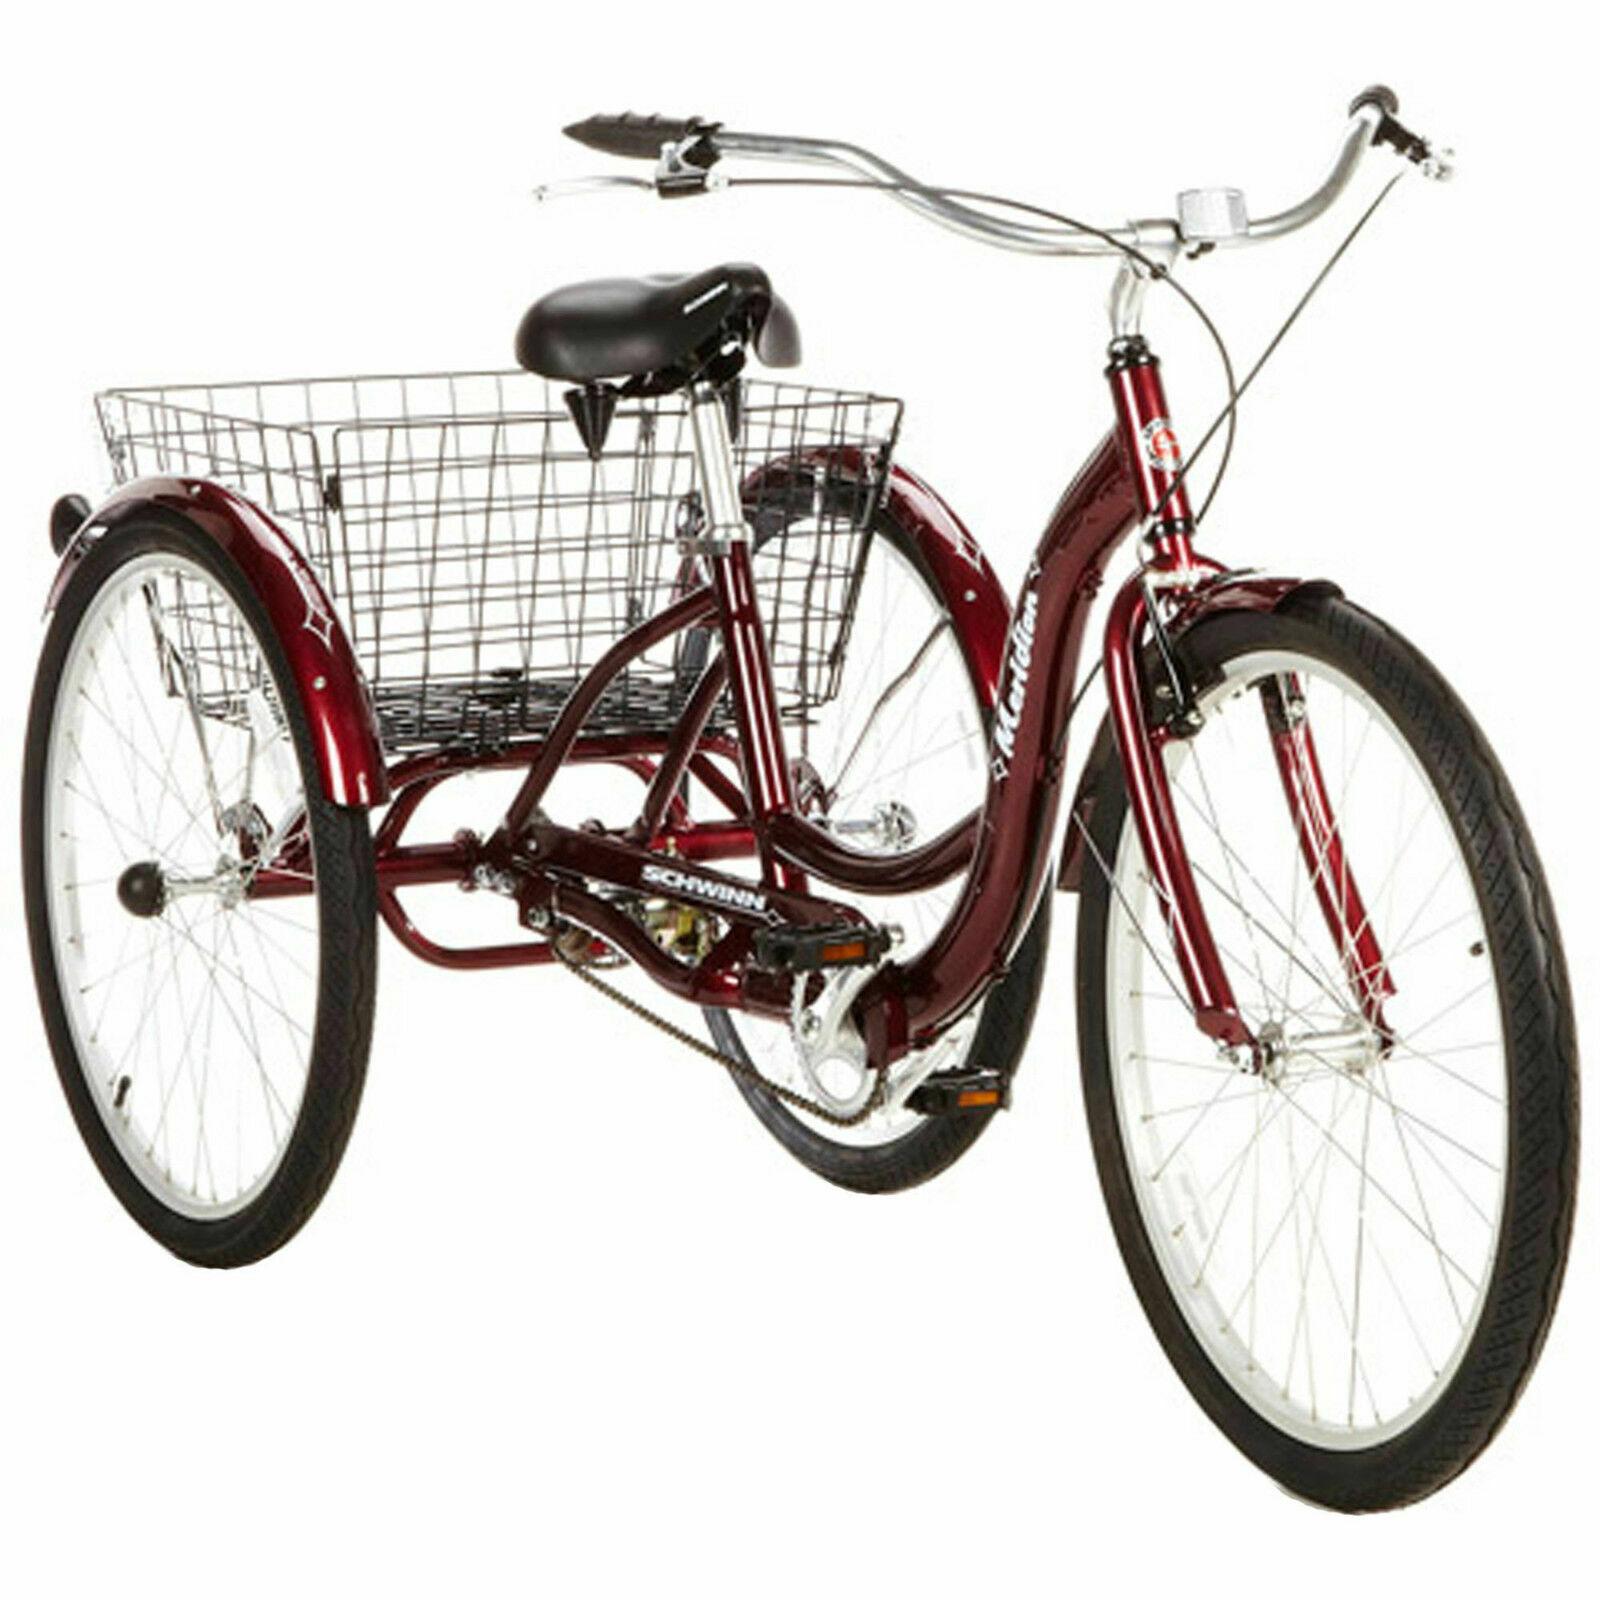 Adult Tricycle Bike 26  3 Wheel Bicycle Basket Beach Cruiser Trike Ride Red New